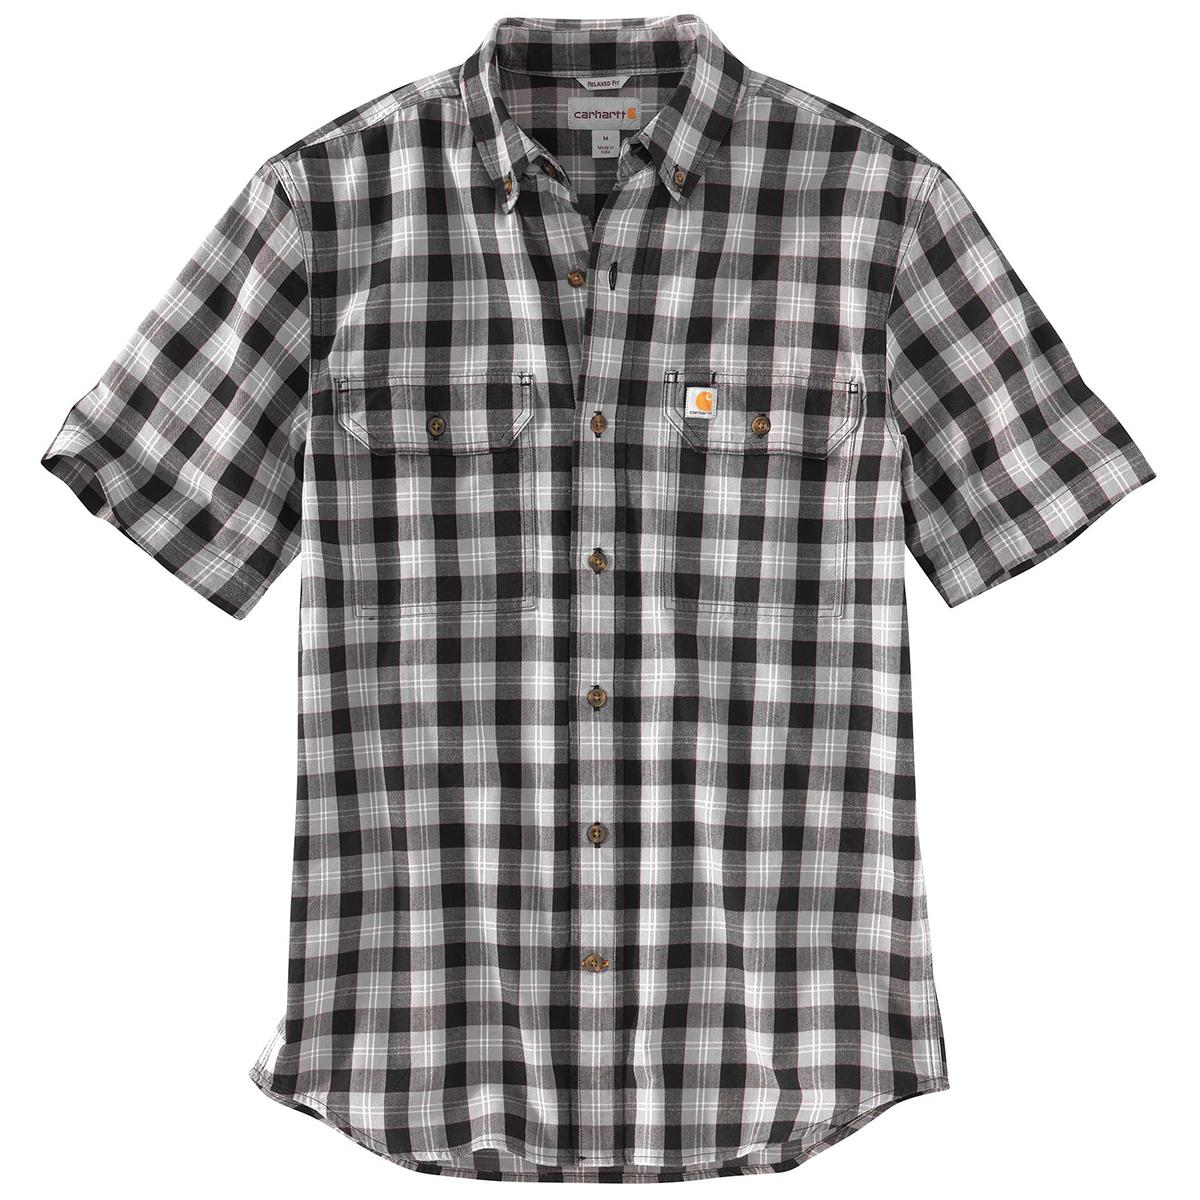 Carhartt Men's 103553 Fort Plaid Short-Sleeve Shirt - Black, XL